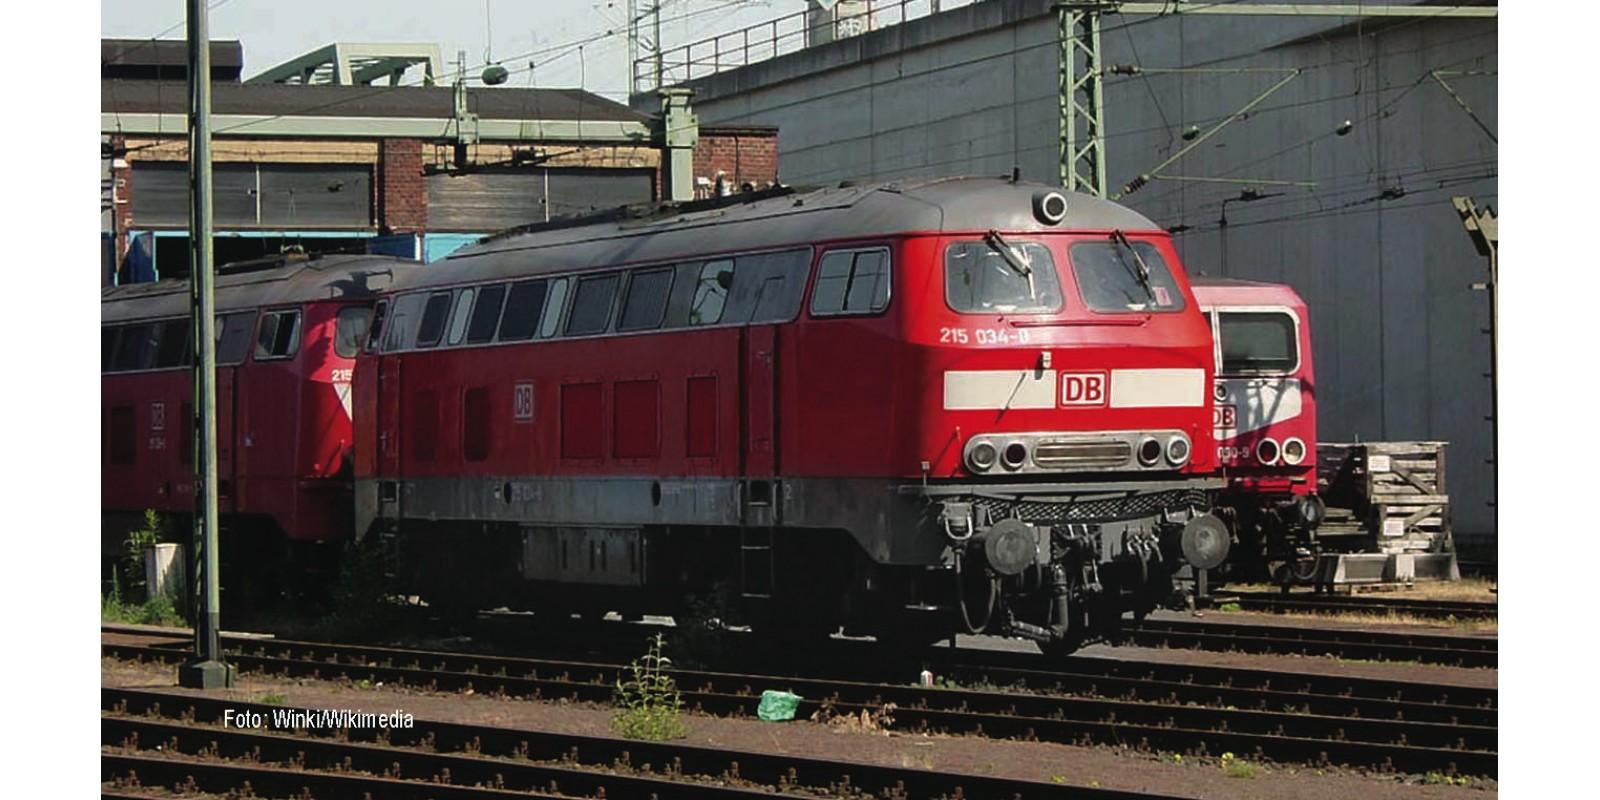 FL424005 - Diesel locomotive class 215, DB AG, DC analog